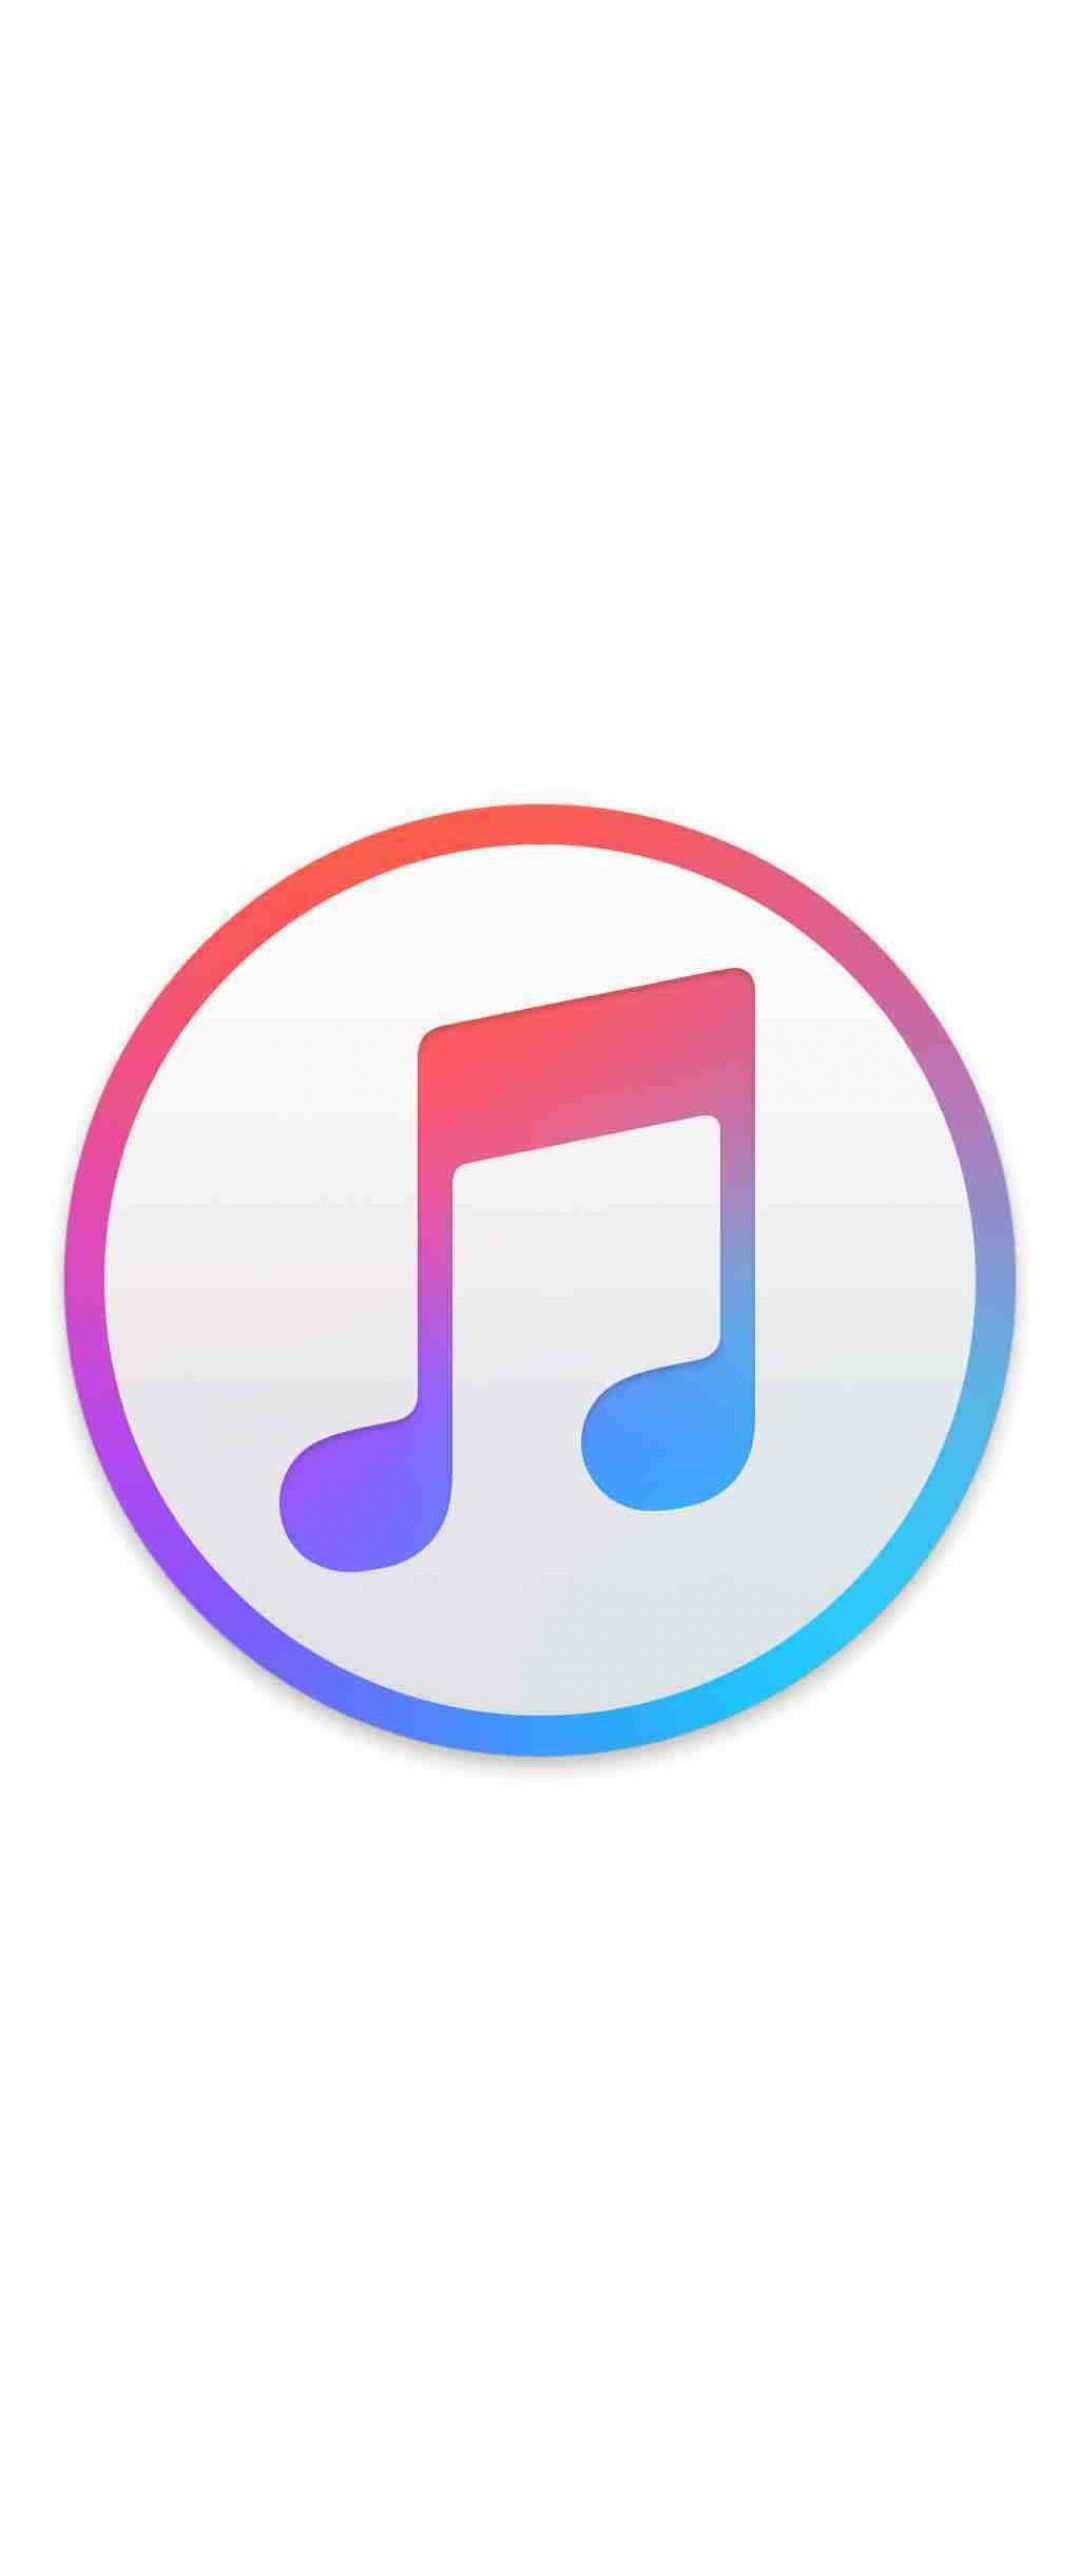 Apple elimina una característica principal de iTunes para Windows